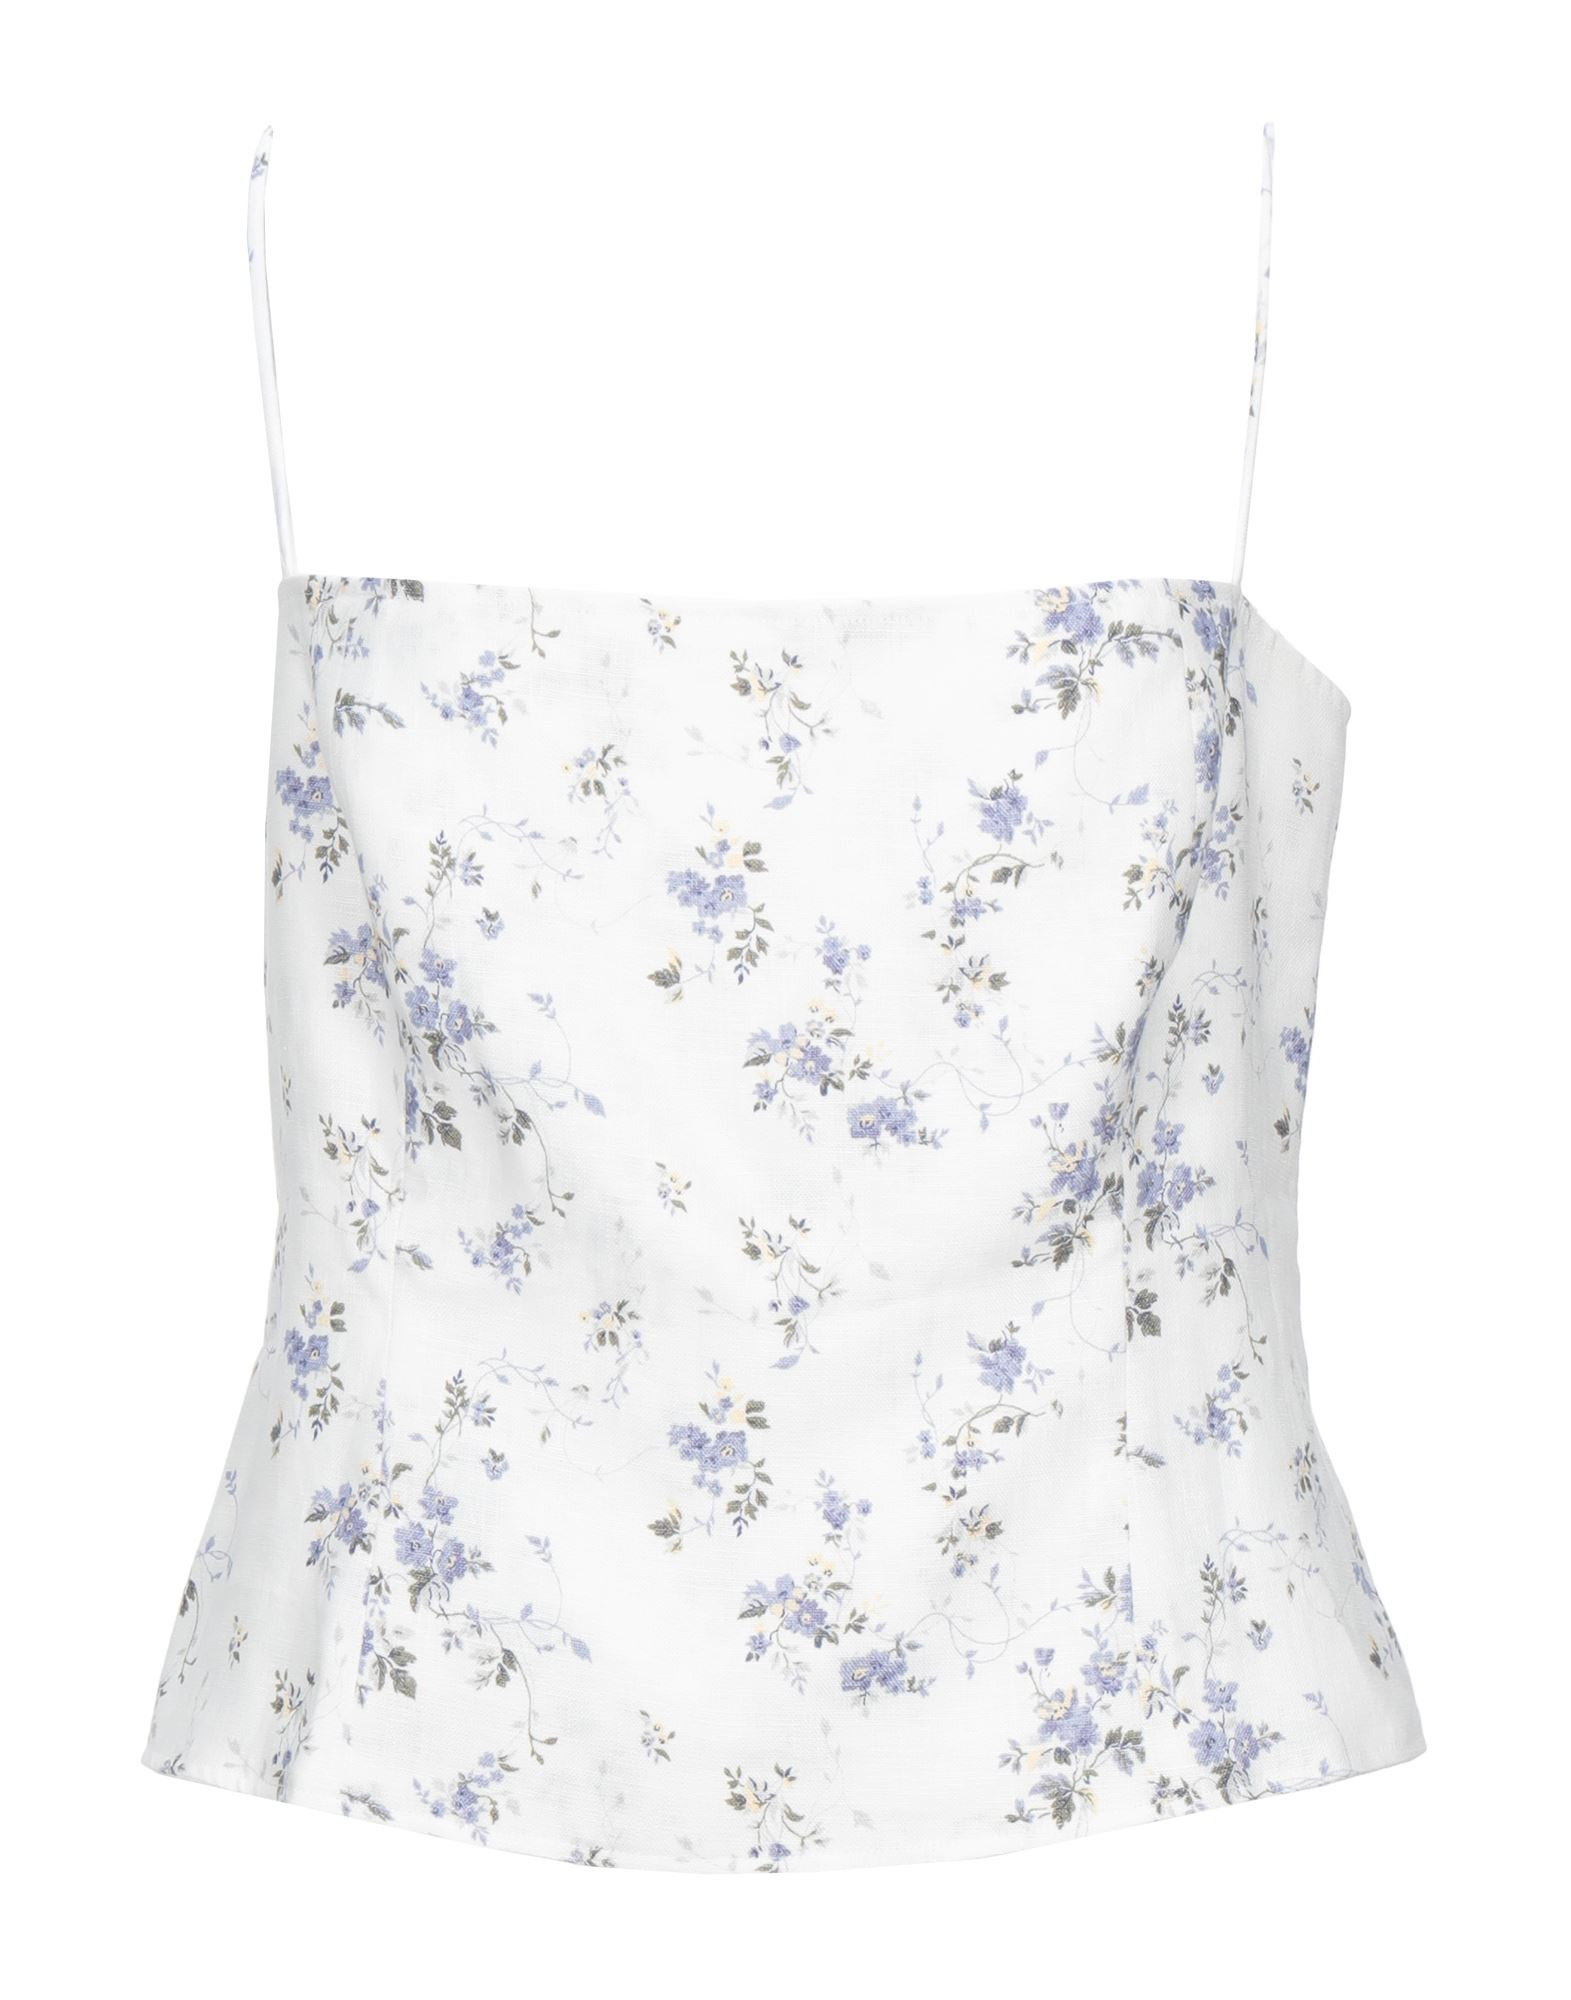 REFORMATION Tops. plain weave, no appliqués, floral design, deep neckline, sleeveless, front closure, zipper closure, no pockets. 100% Linen